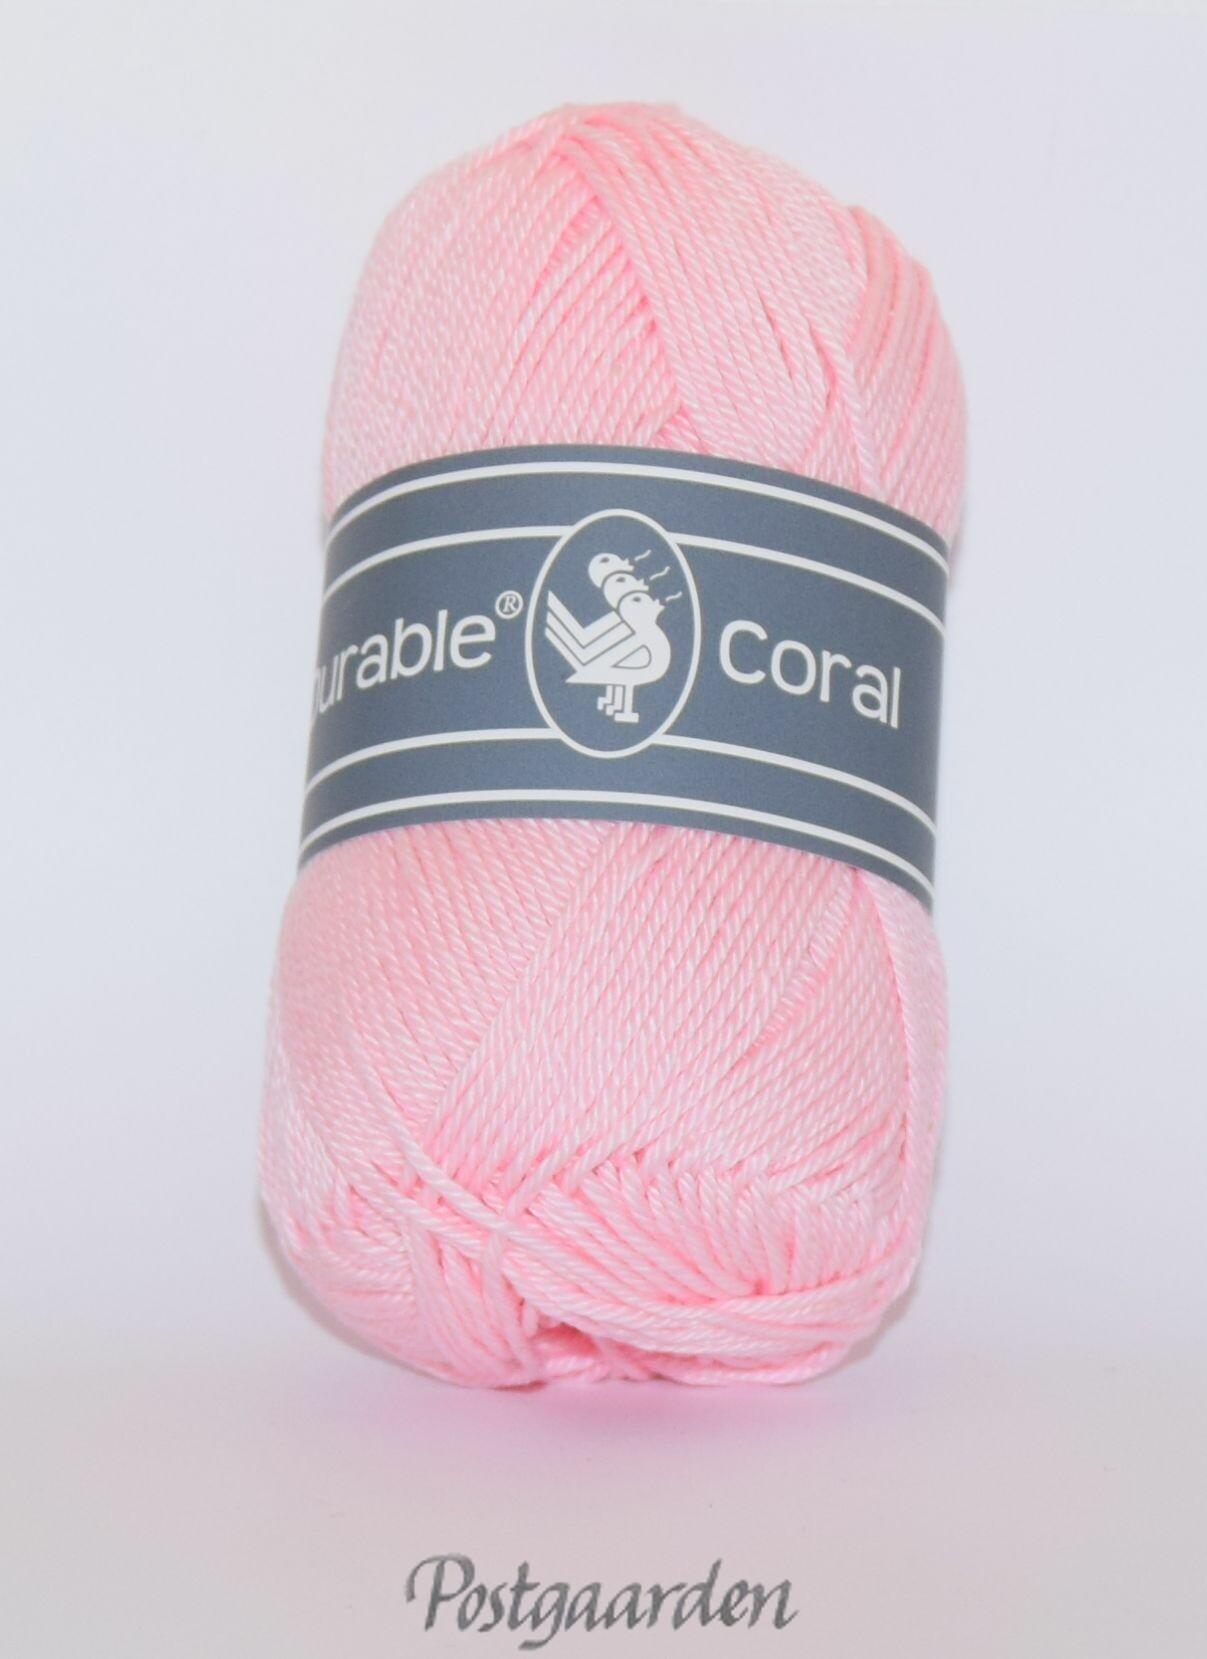 386 - Rosa Durable Coral Bomuldsgarn